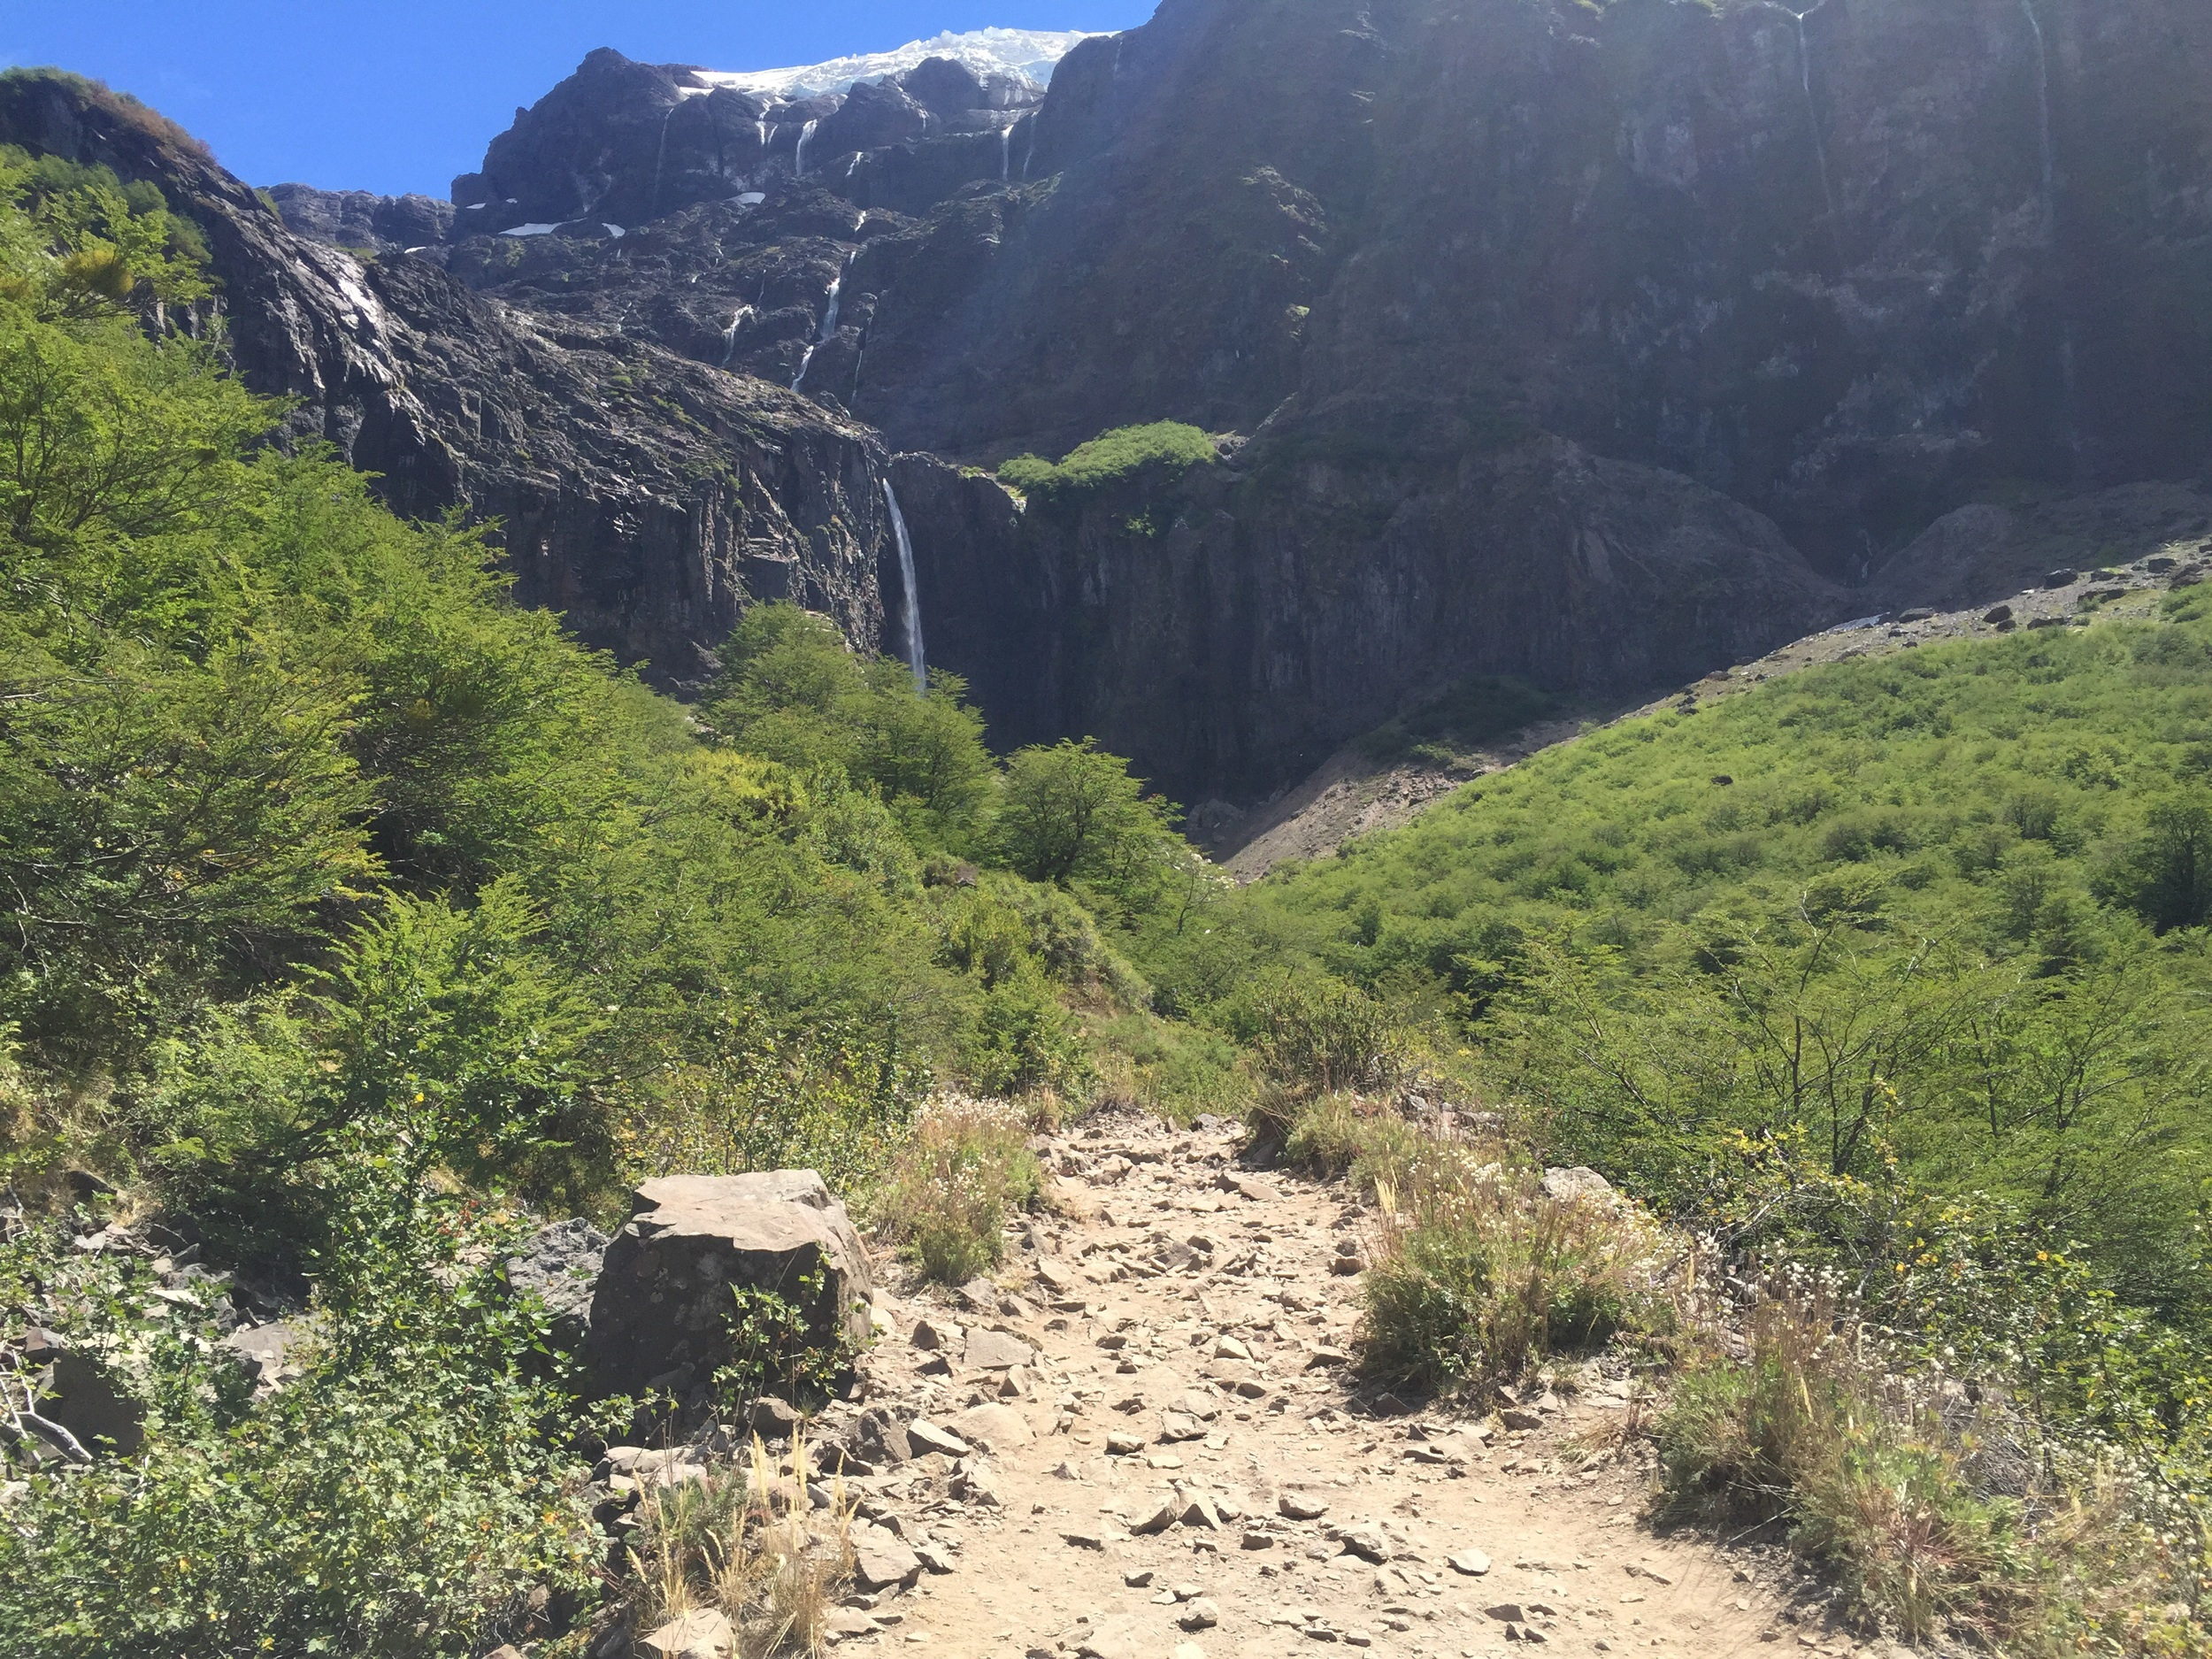 Hiking up to see glacial waterfalls.